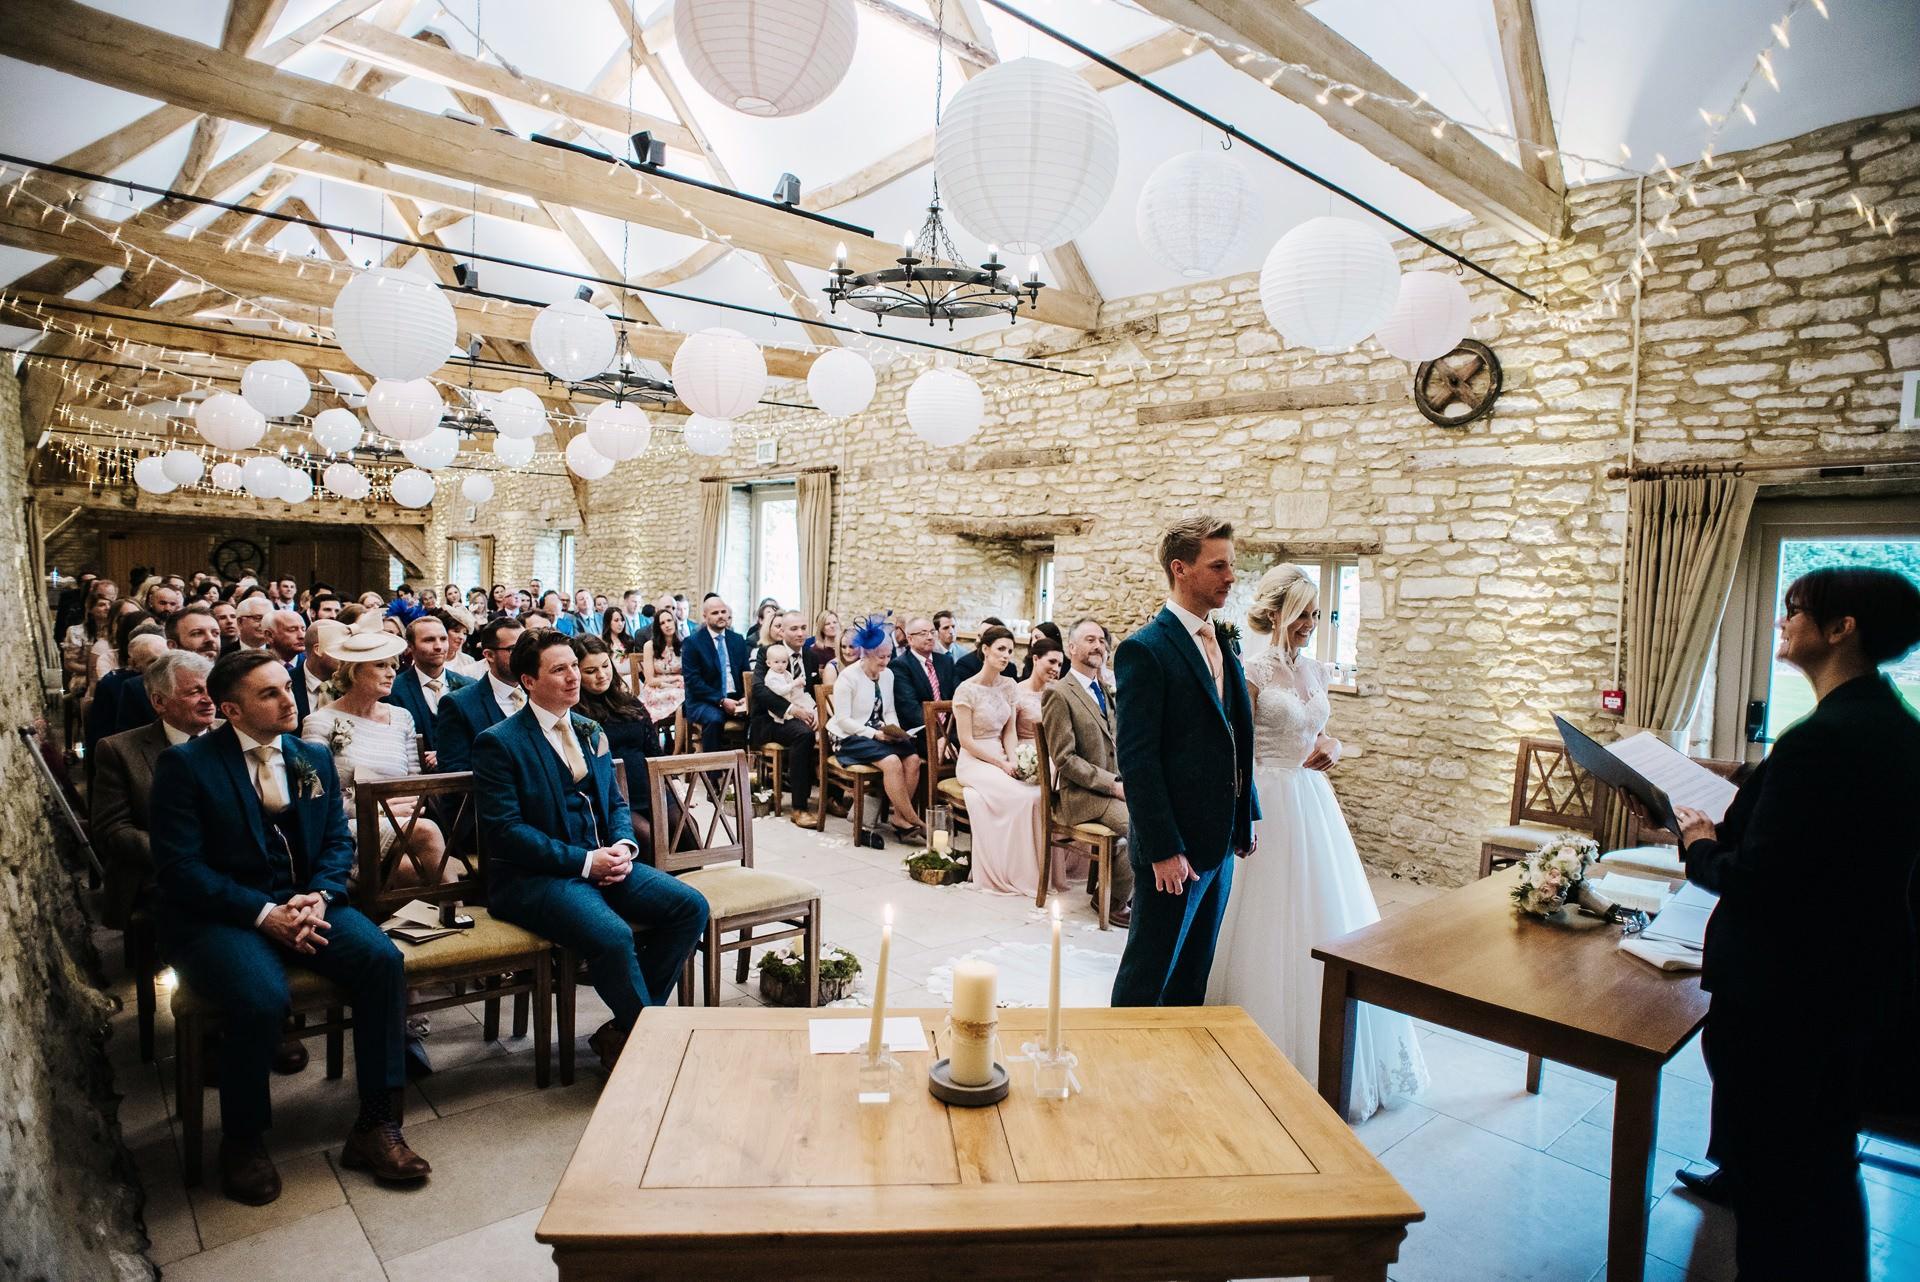 Caswell House Wedding Photographer - Jessica & Chris 11